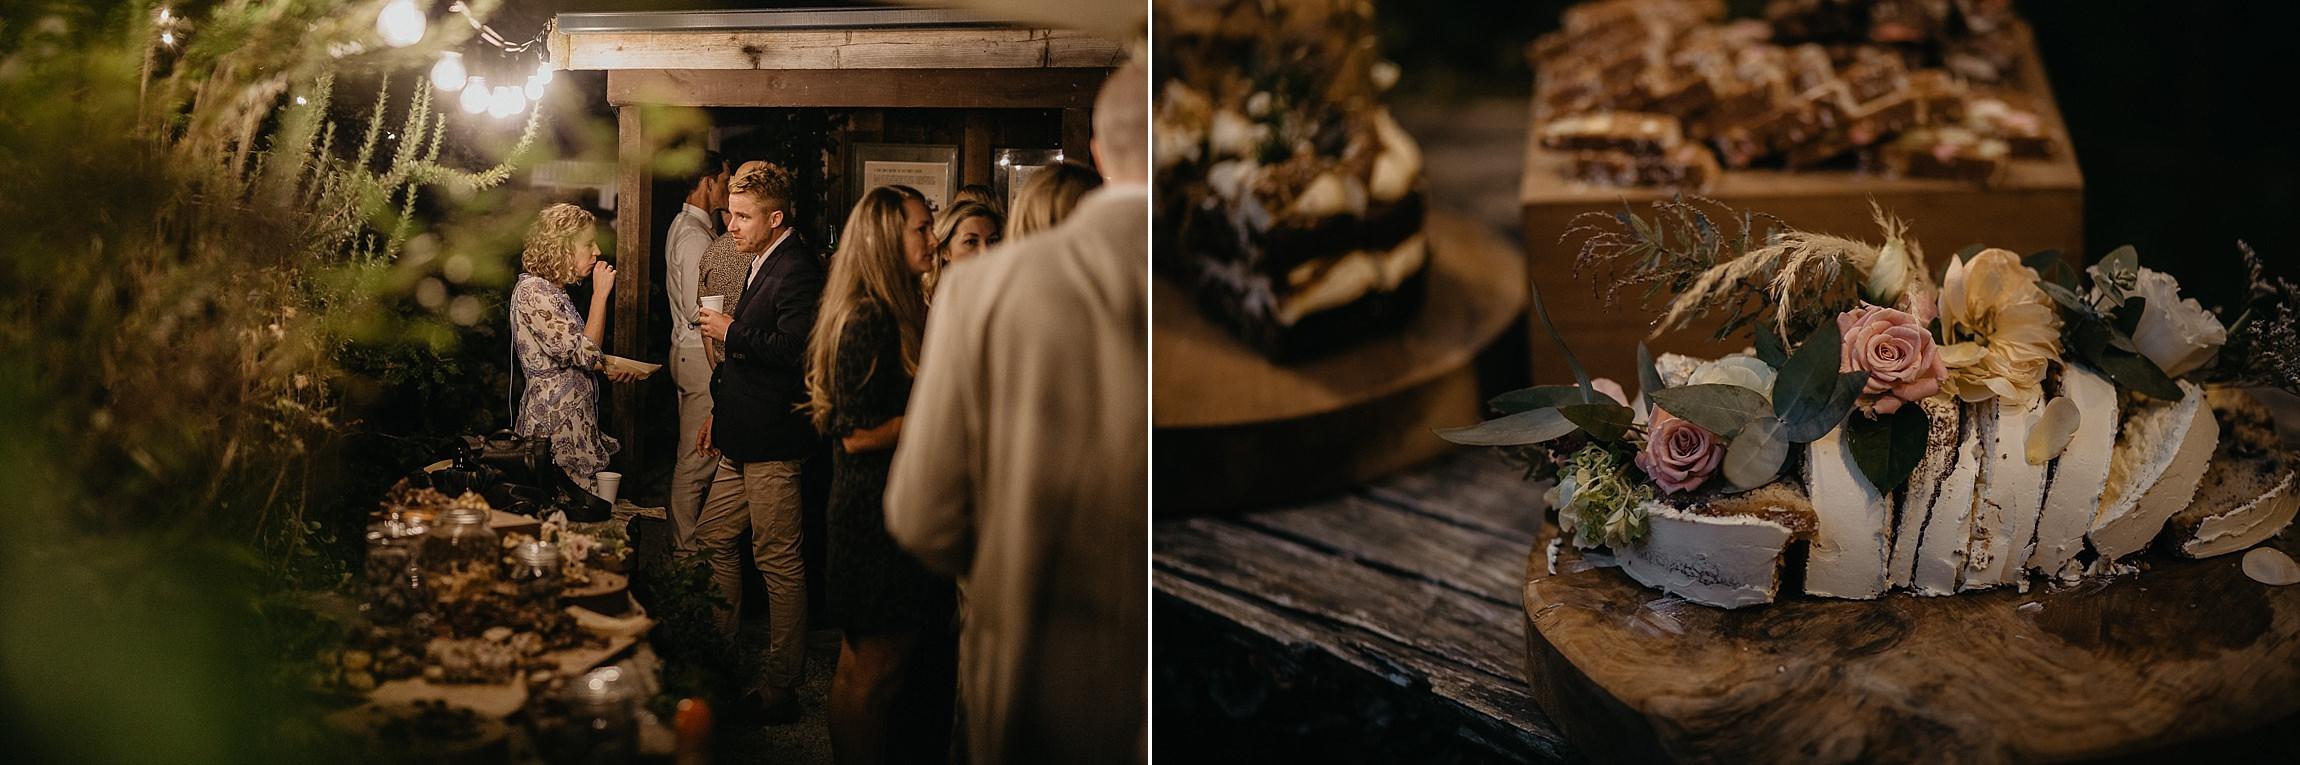 oldforestschool-wedding-blog-193.jpg